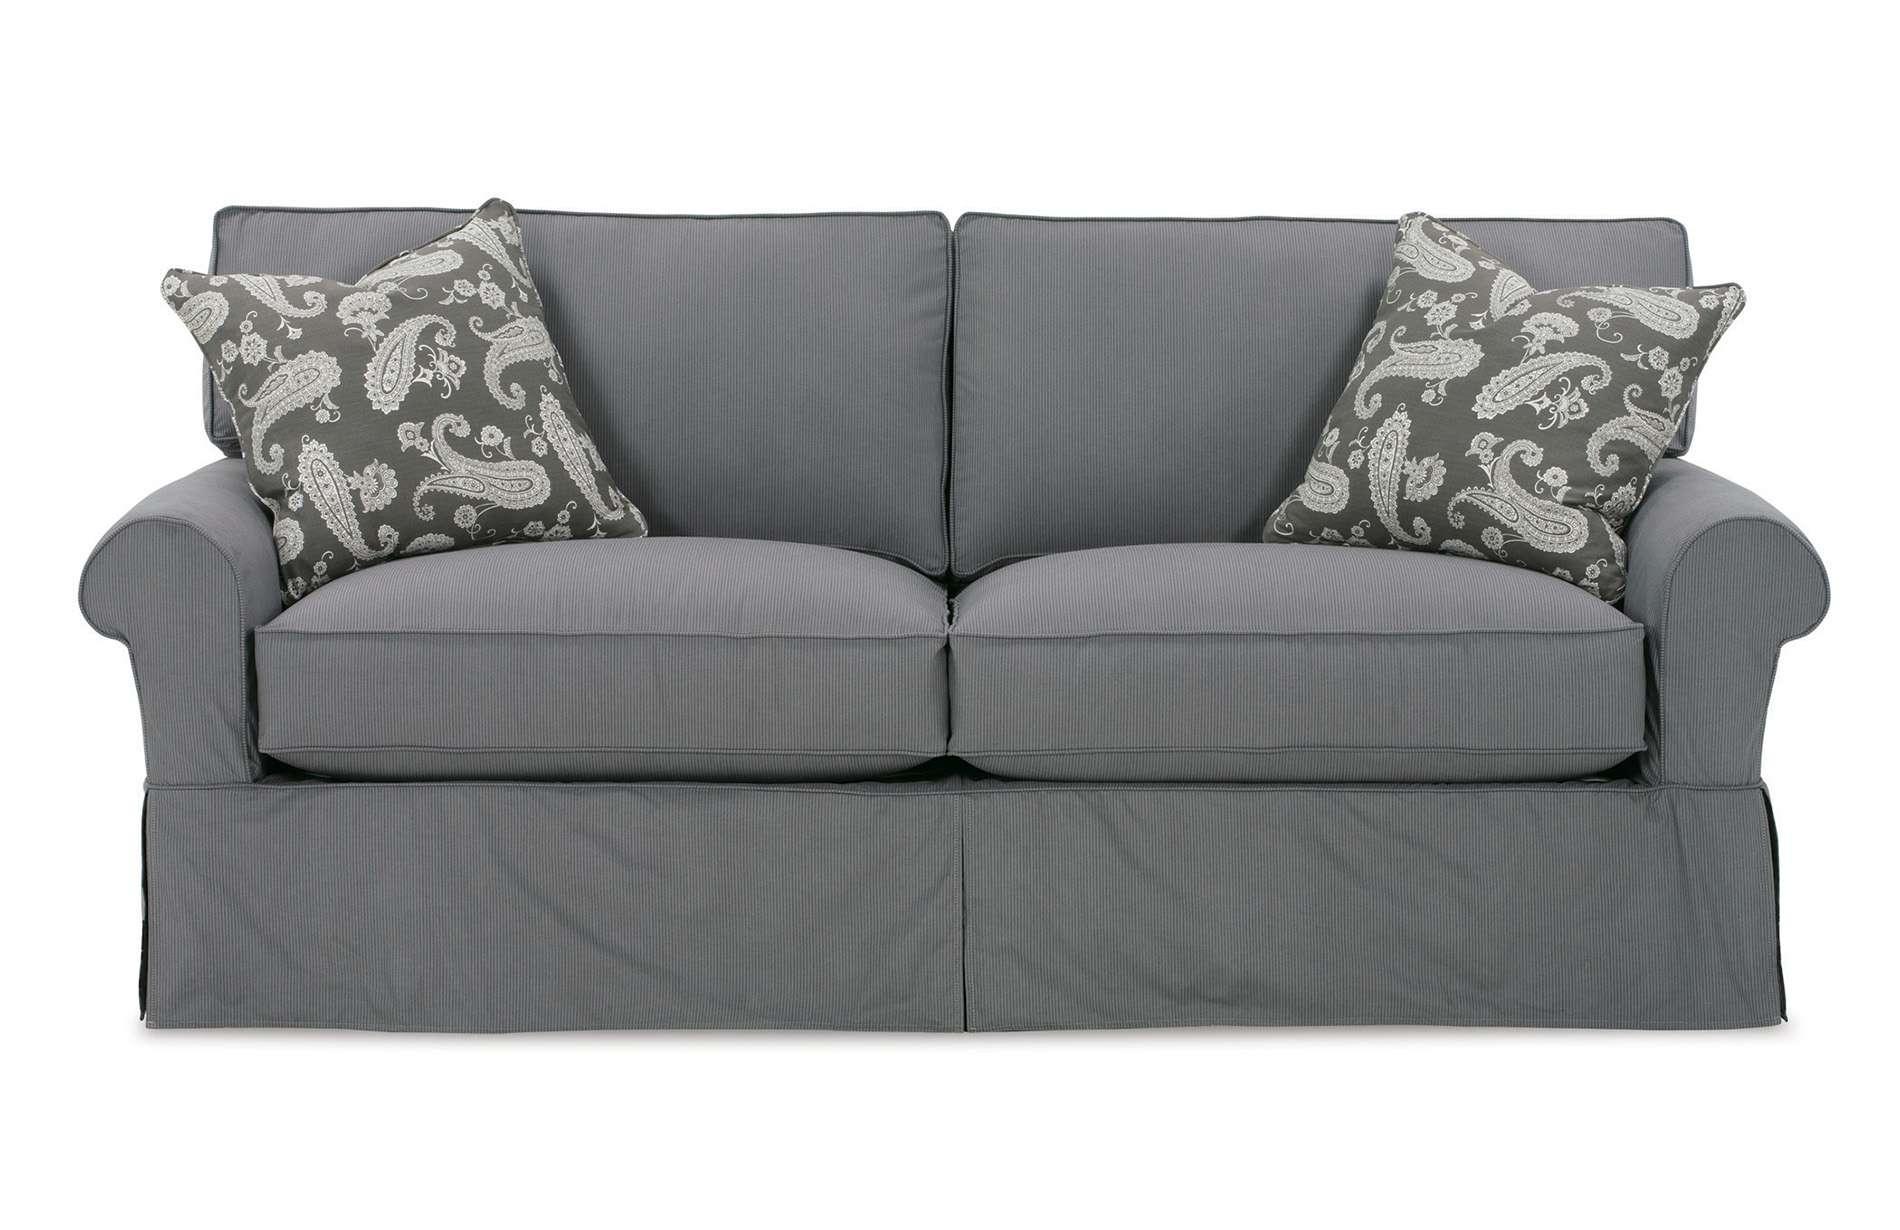 Image Result For Rowe Furniture Nantucket Slipcover Sofa